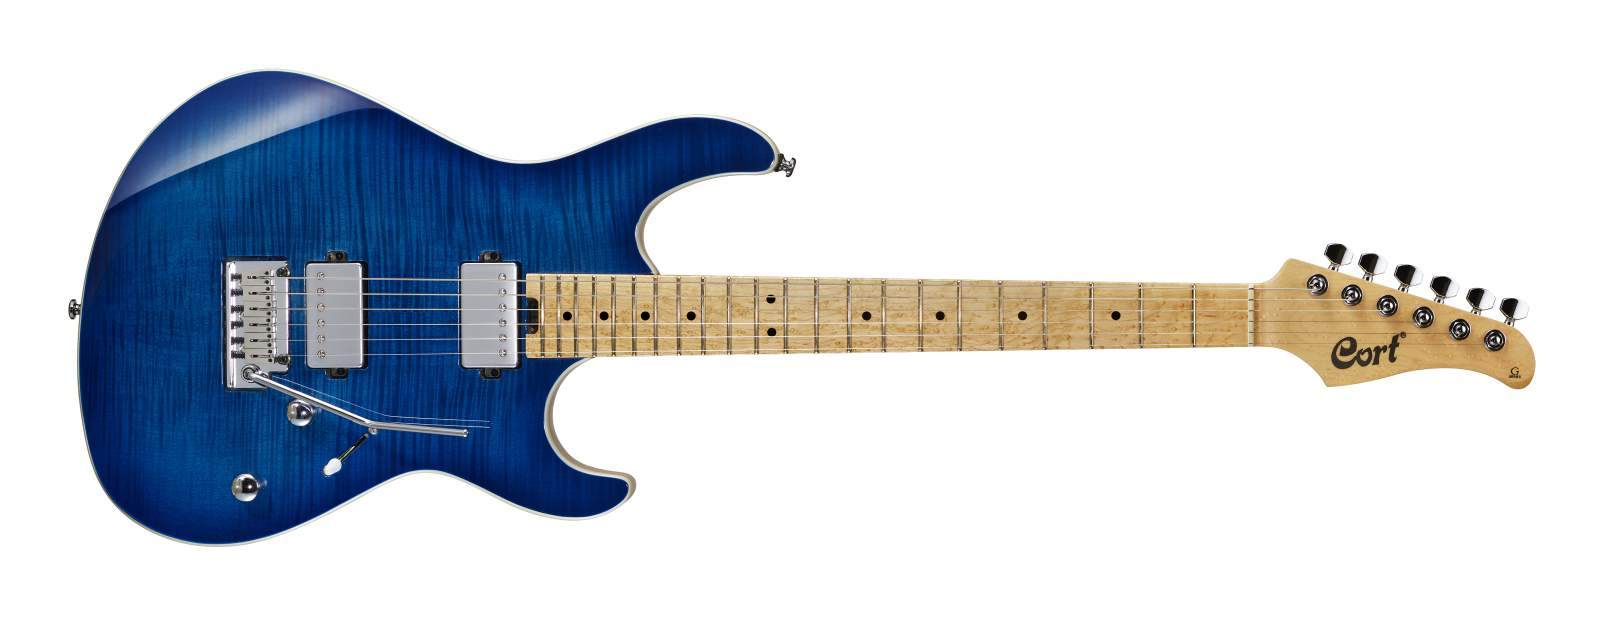 Cort G290 FAT E-Gitarre Bright Blue Burst